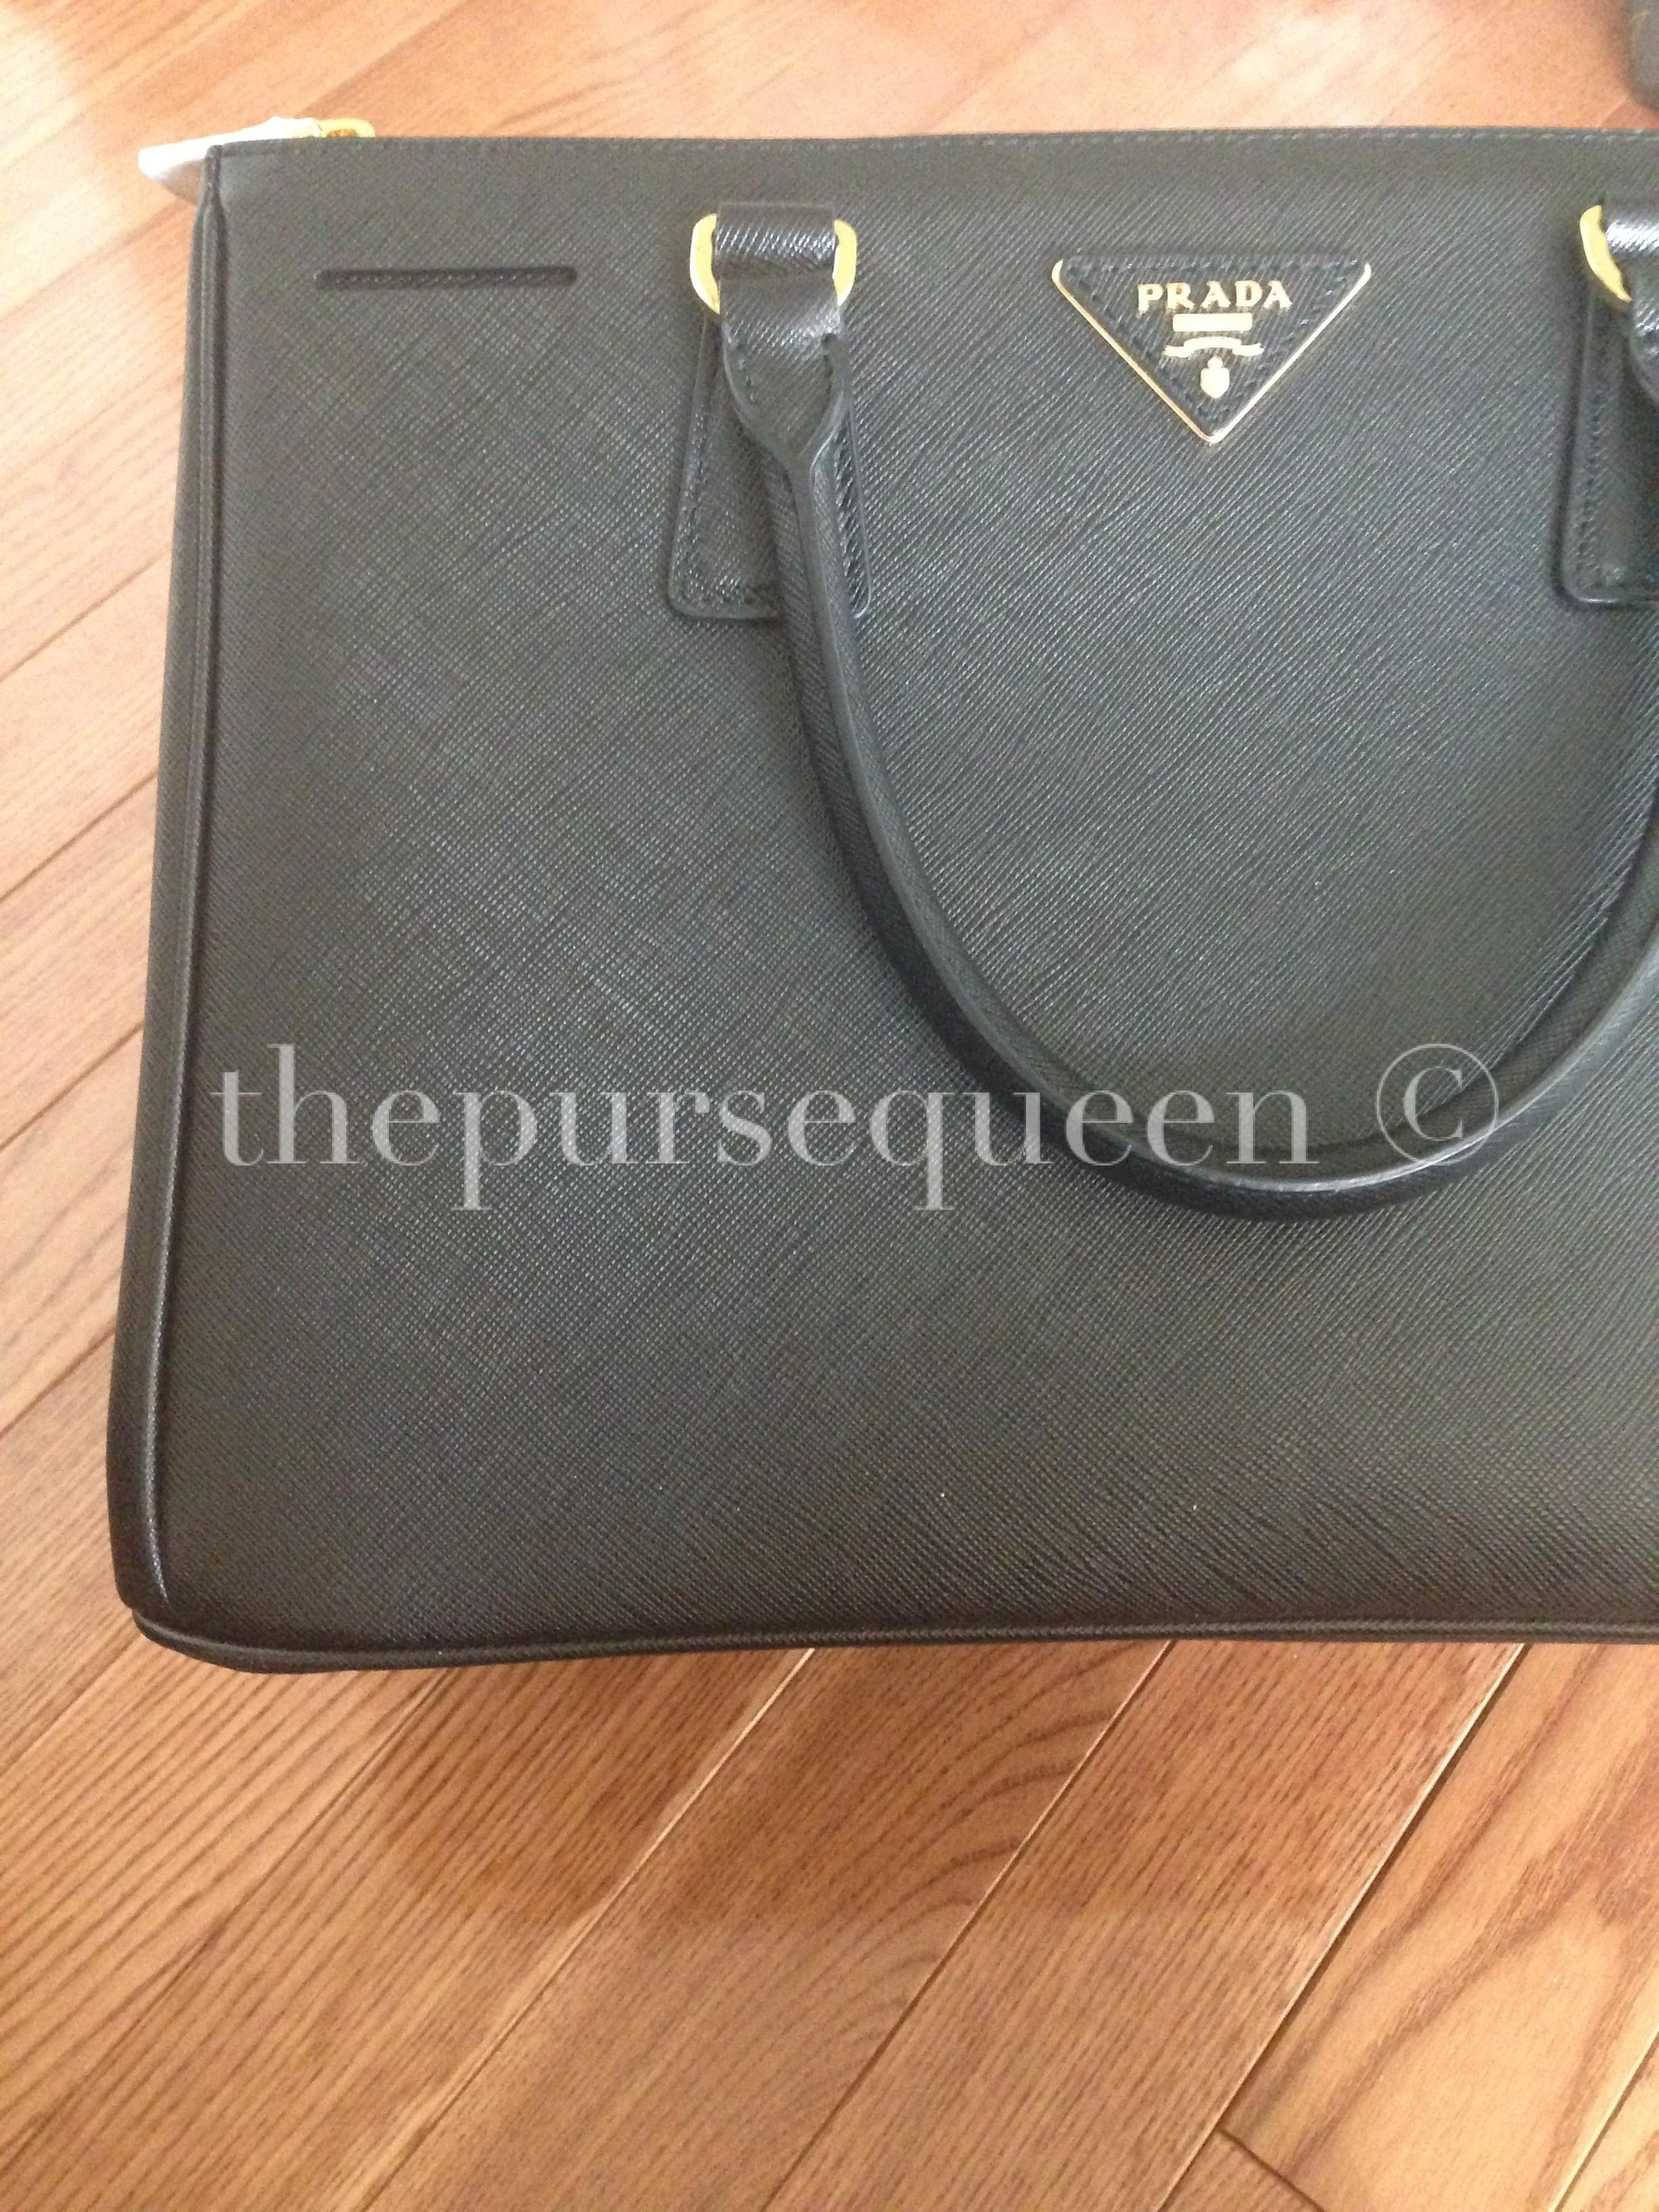 ab38aaf46b6c fake Prada Archives - Authentic   Replica Handbag Reviews by The ...